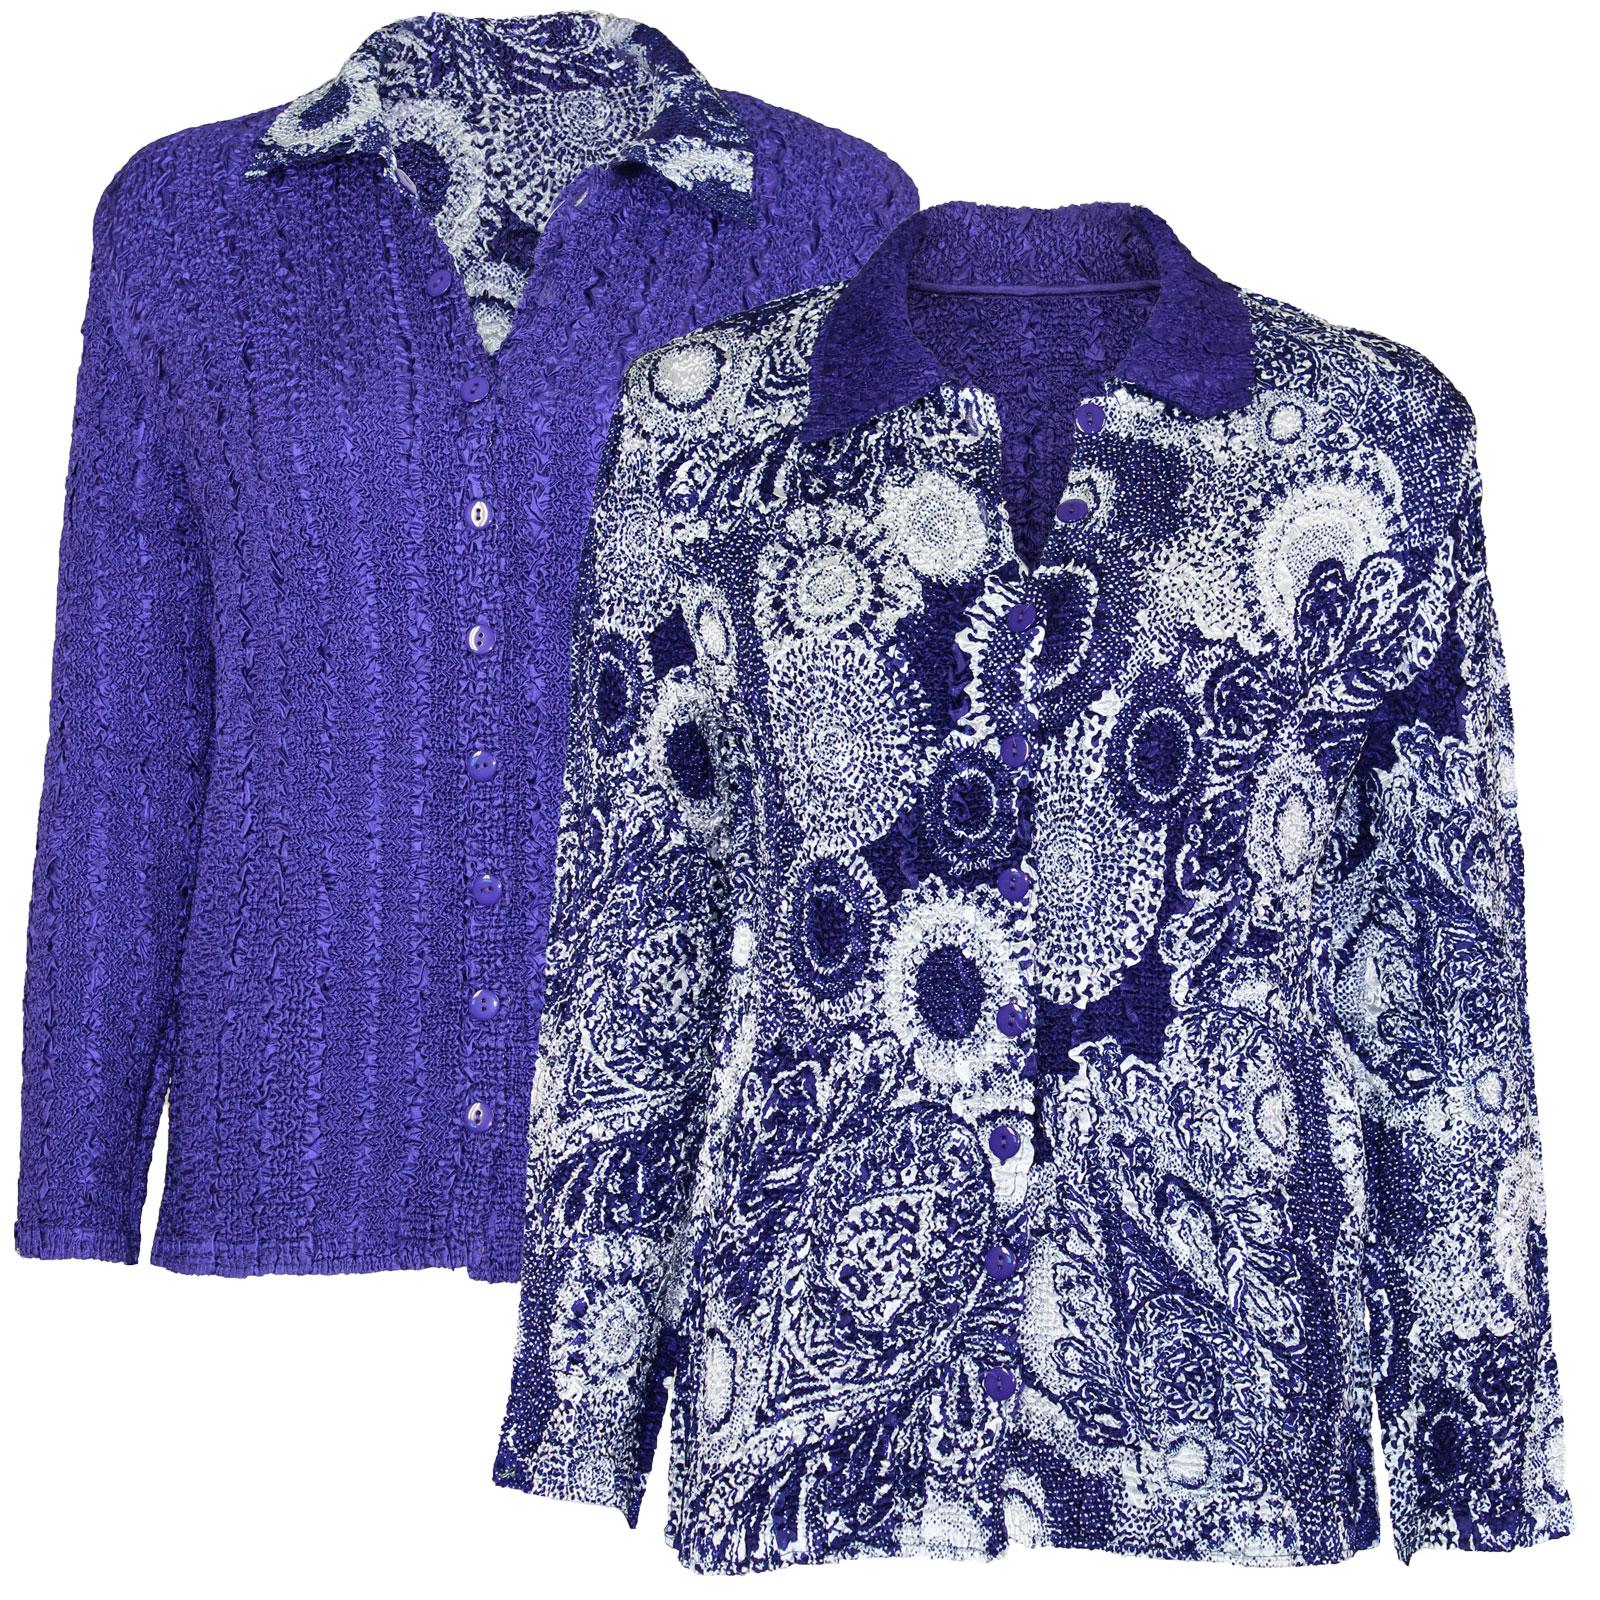 Wholesale Magic Crush - Reversible Jackets #14017 - 1X-2X